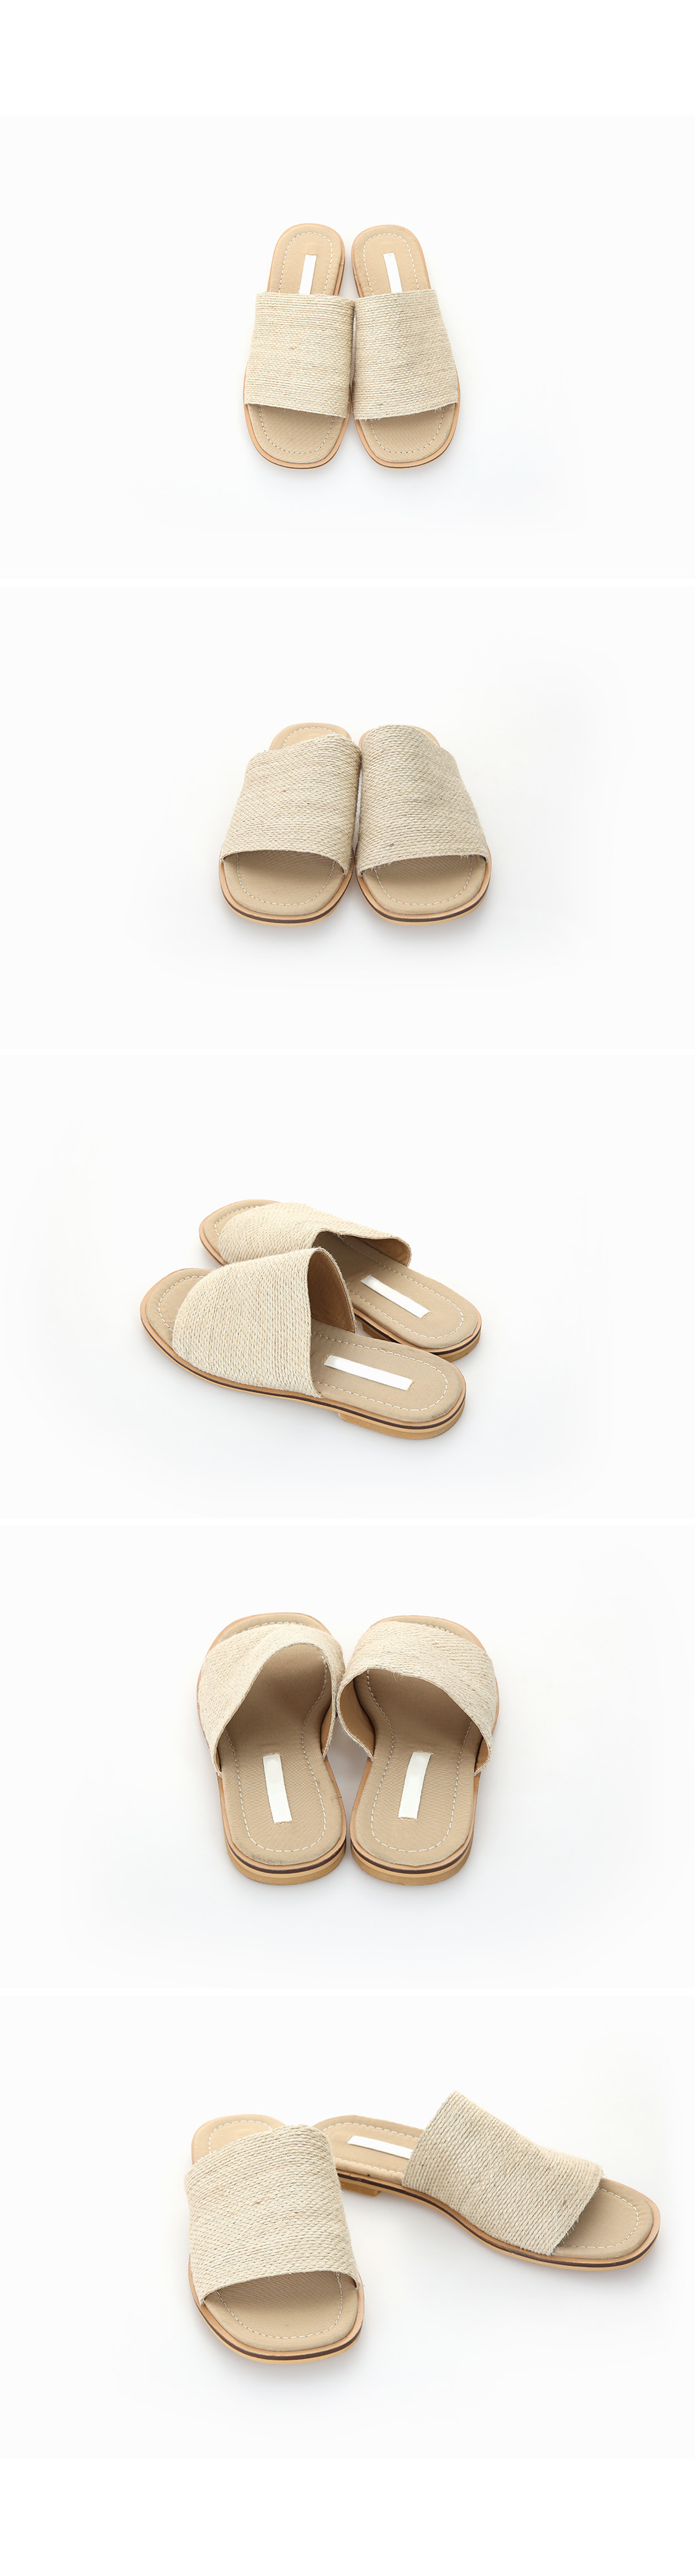 Mimon Ratan Slippers